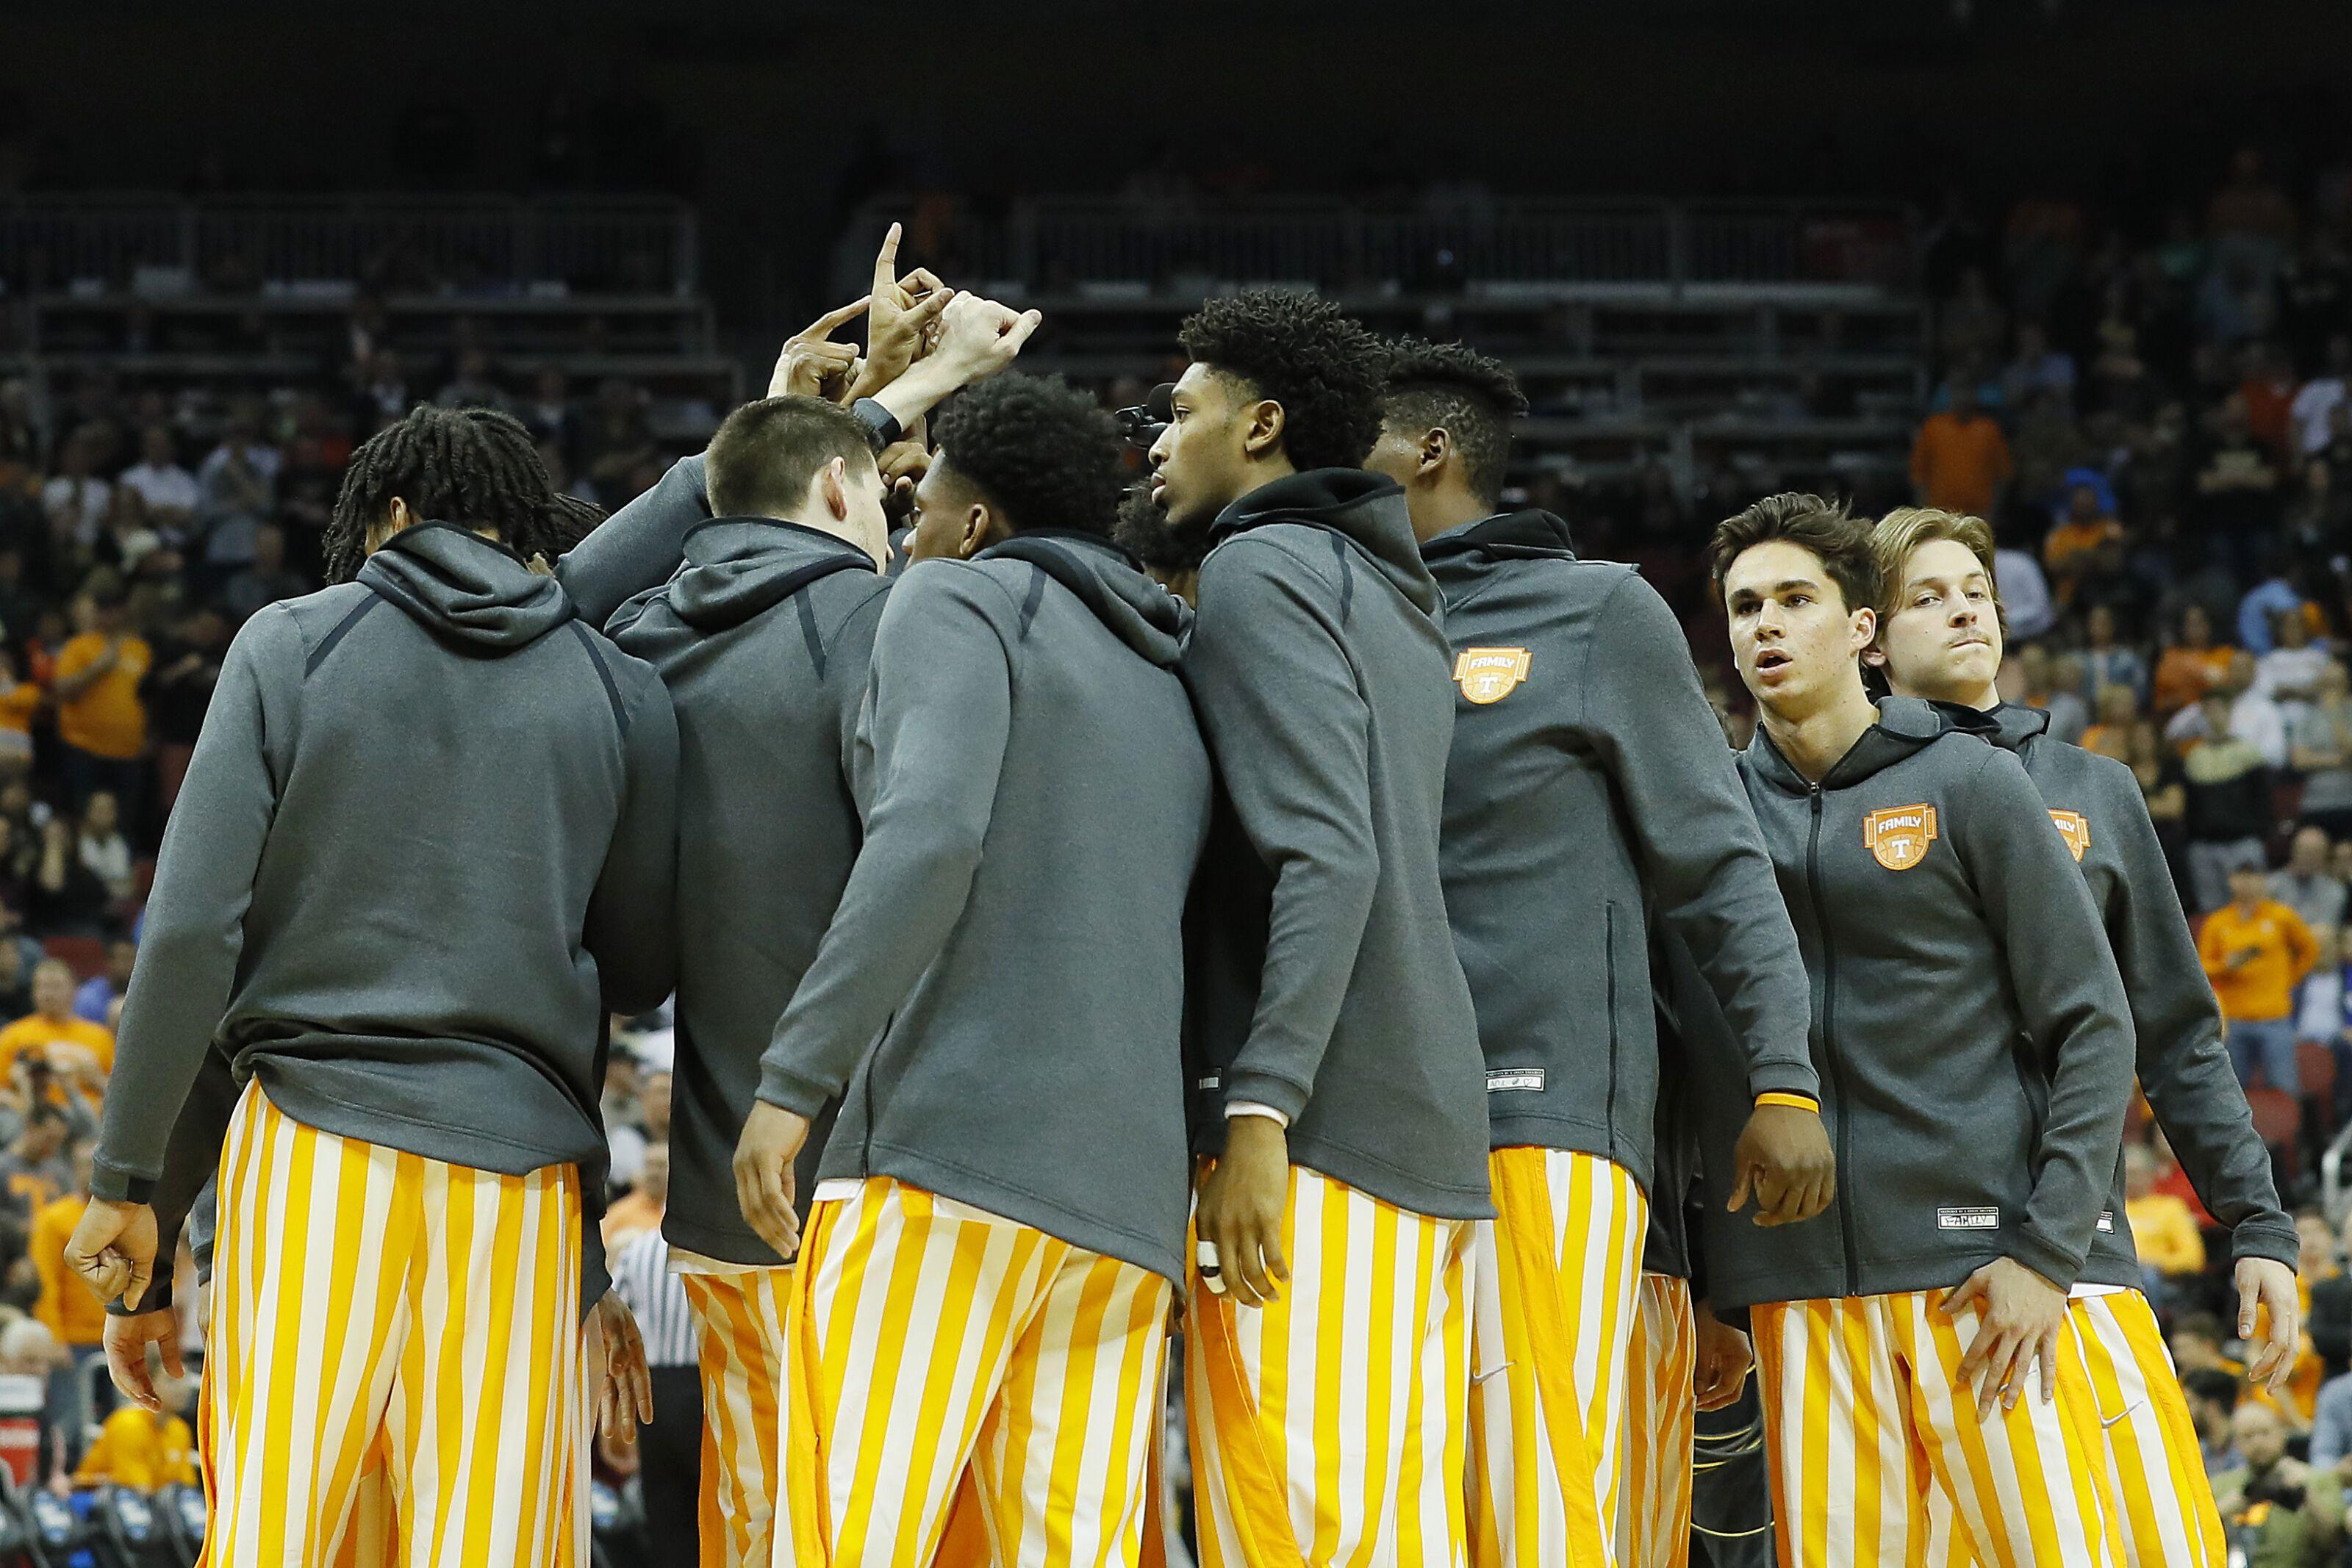 Tennessee basketball: Vols unranked, play eight games vs. AP preseason top 25 teams